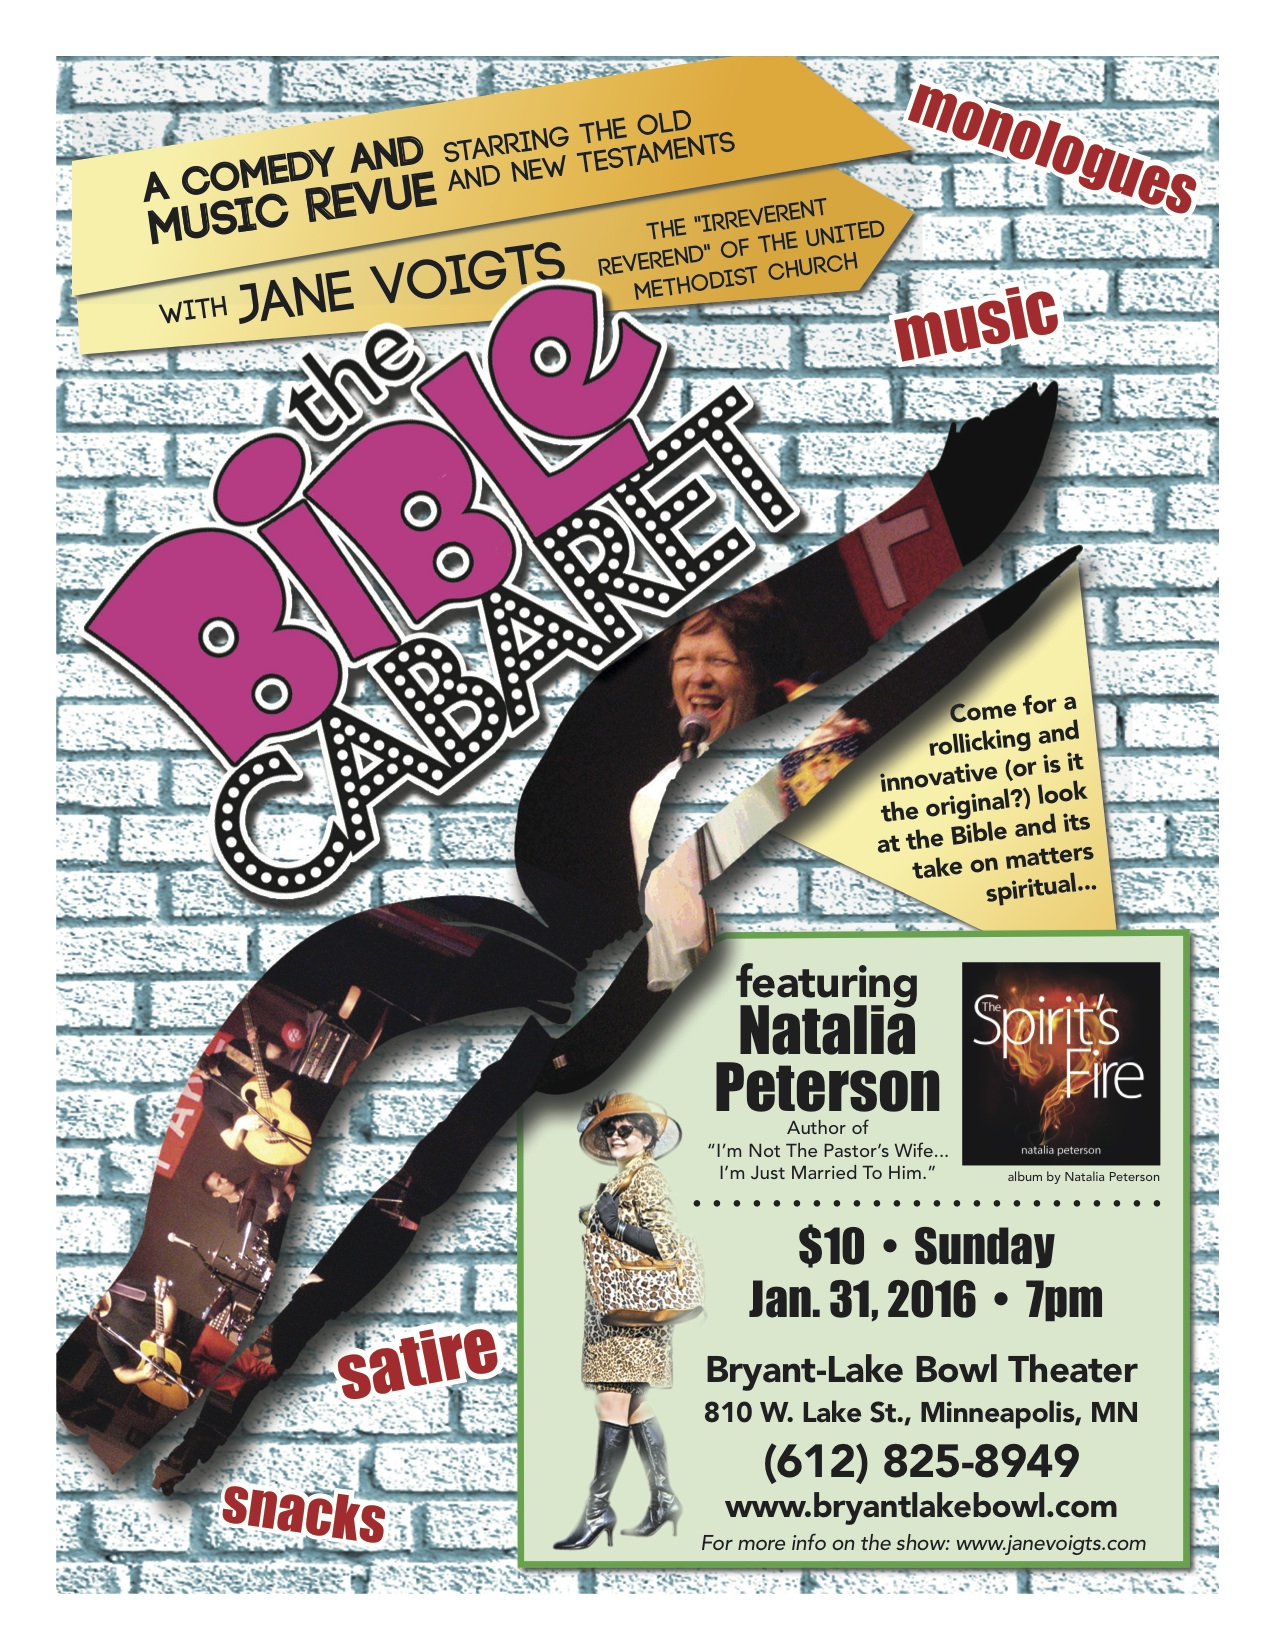 Bible Cabaret 8.5x11 Flyer 1-31 copy.jpg